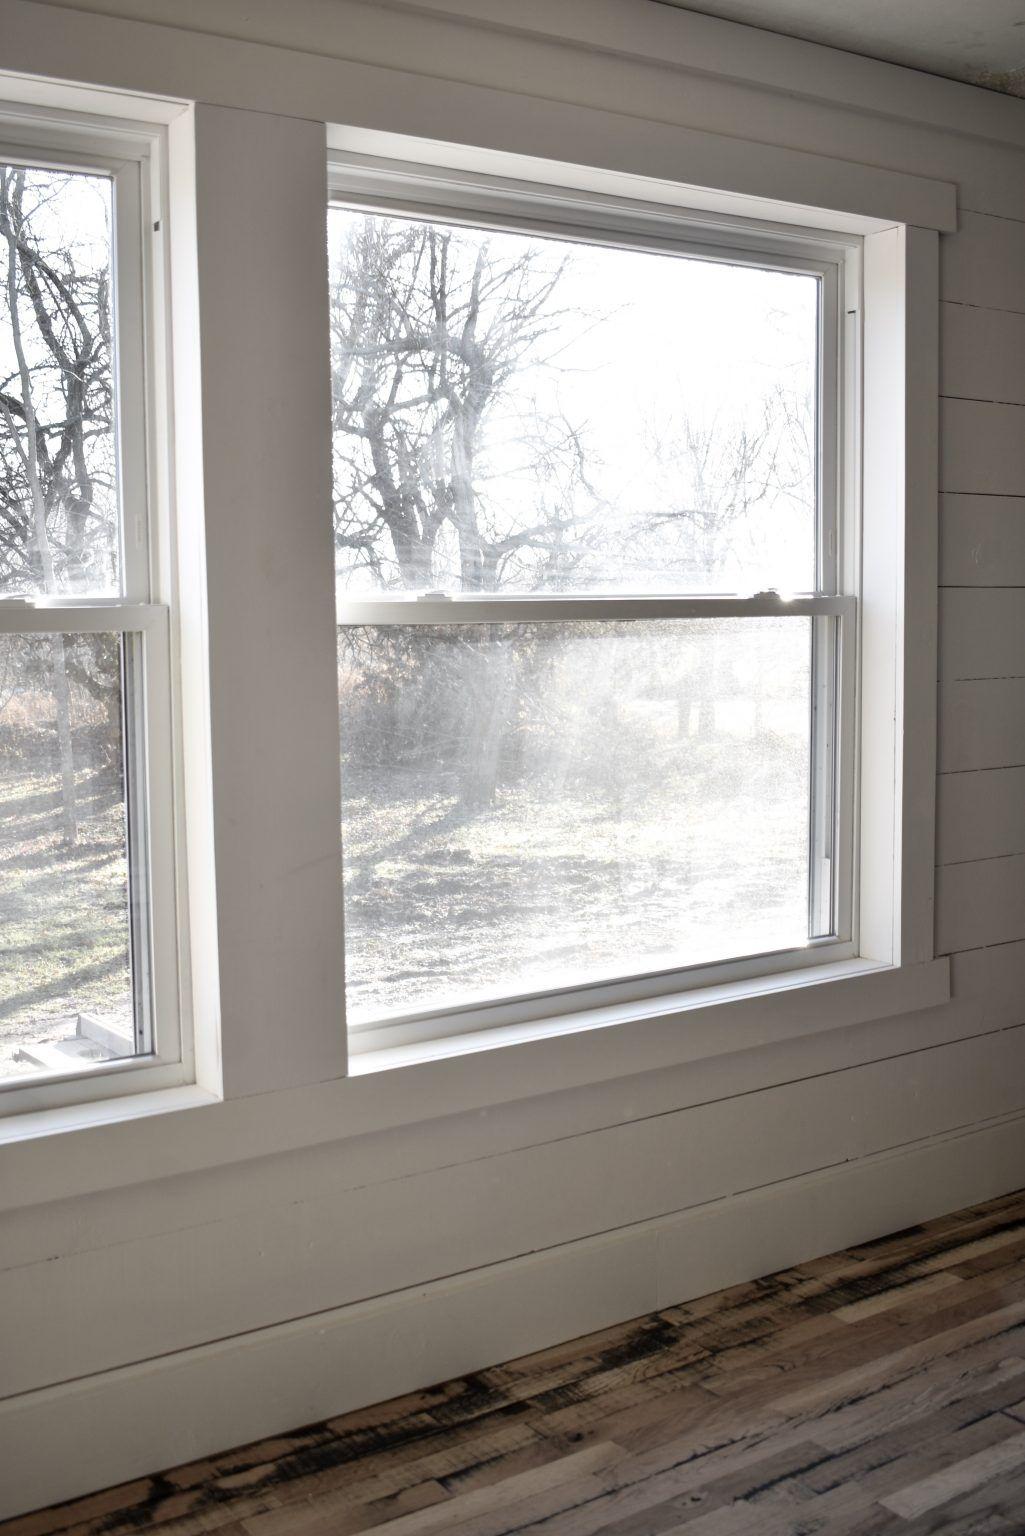 Simple Farmhouse Style Window Trim Farmhouse style